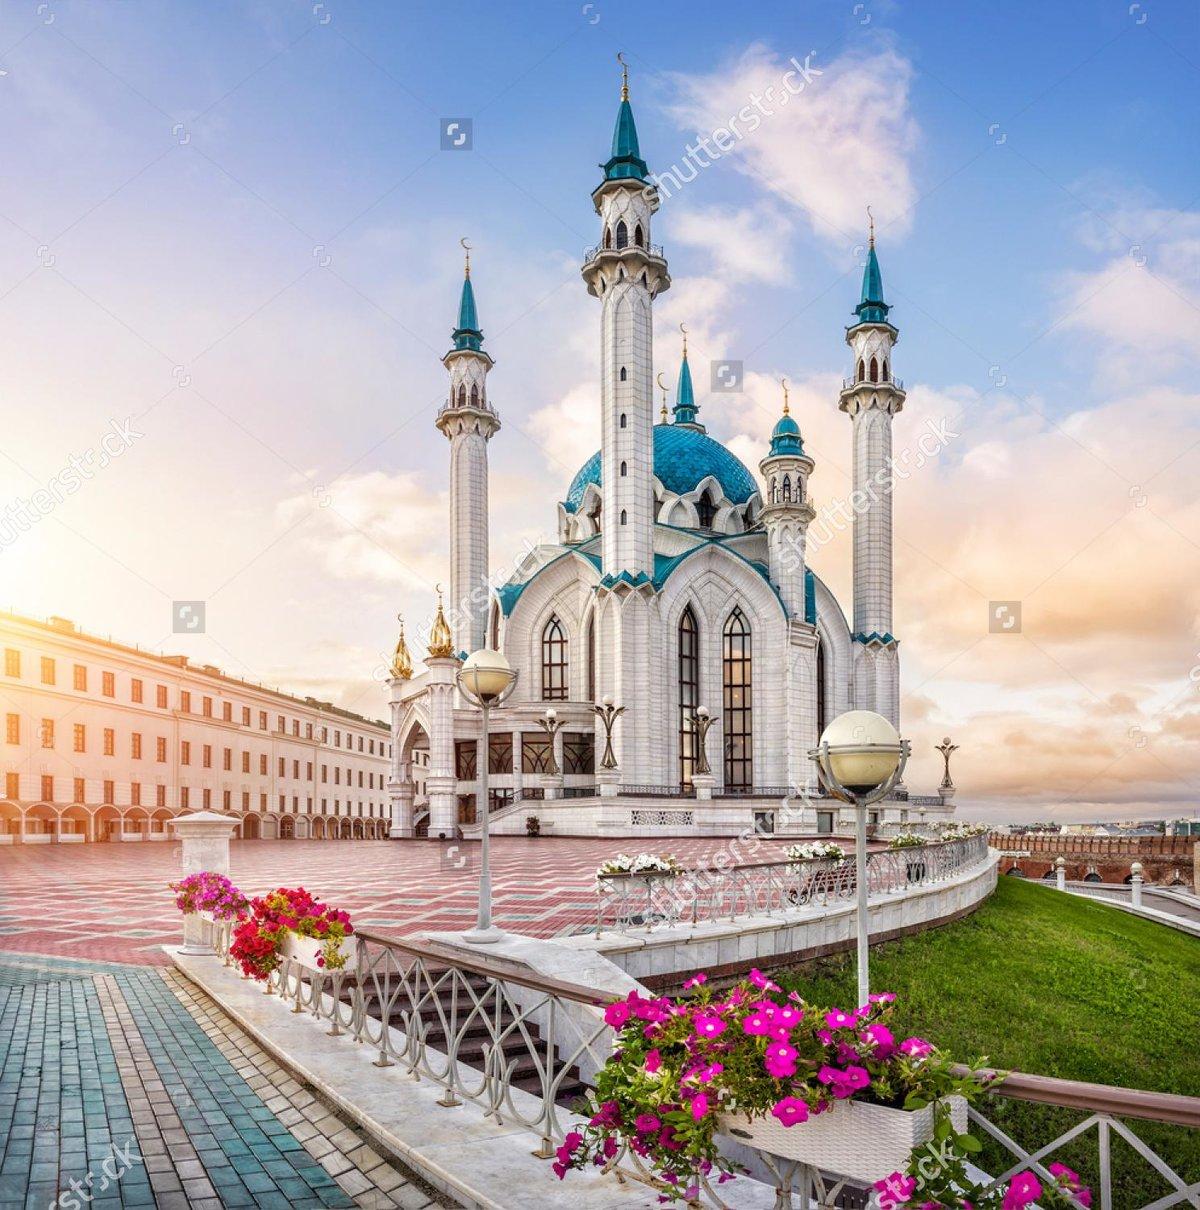 Открытки мечети кул шариф, белкой